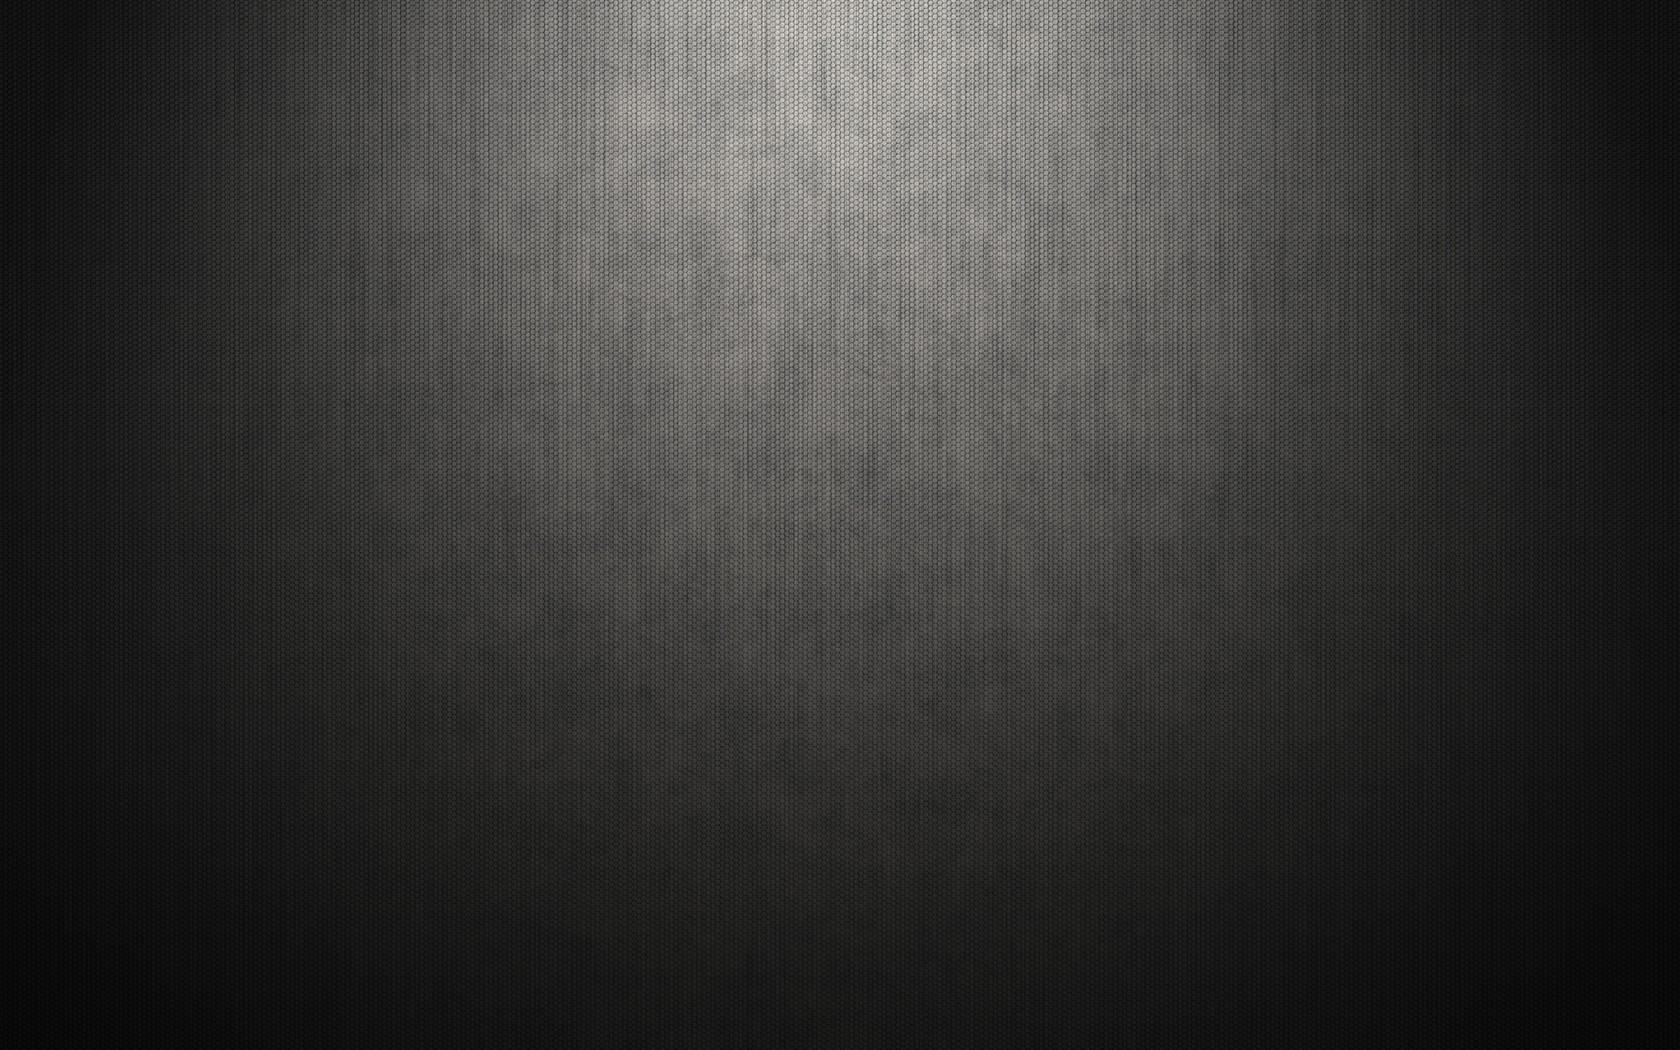 Metallic Black Background wallpaper  1229702